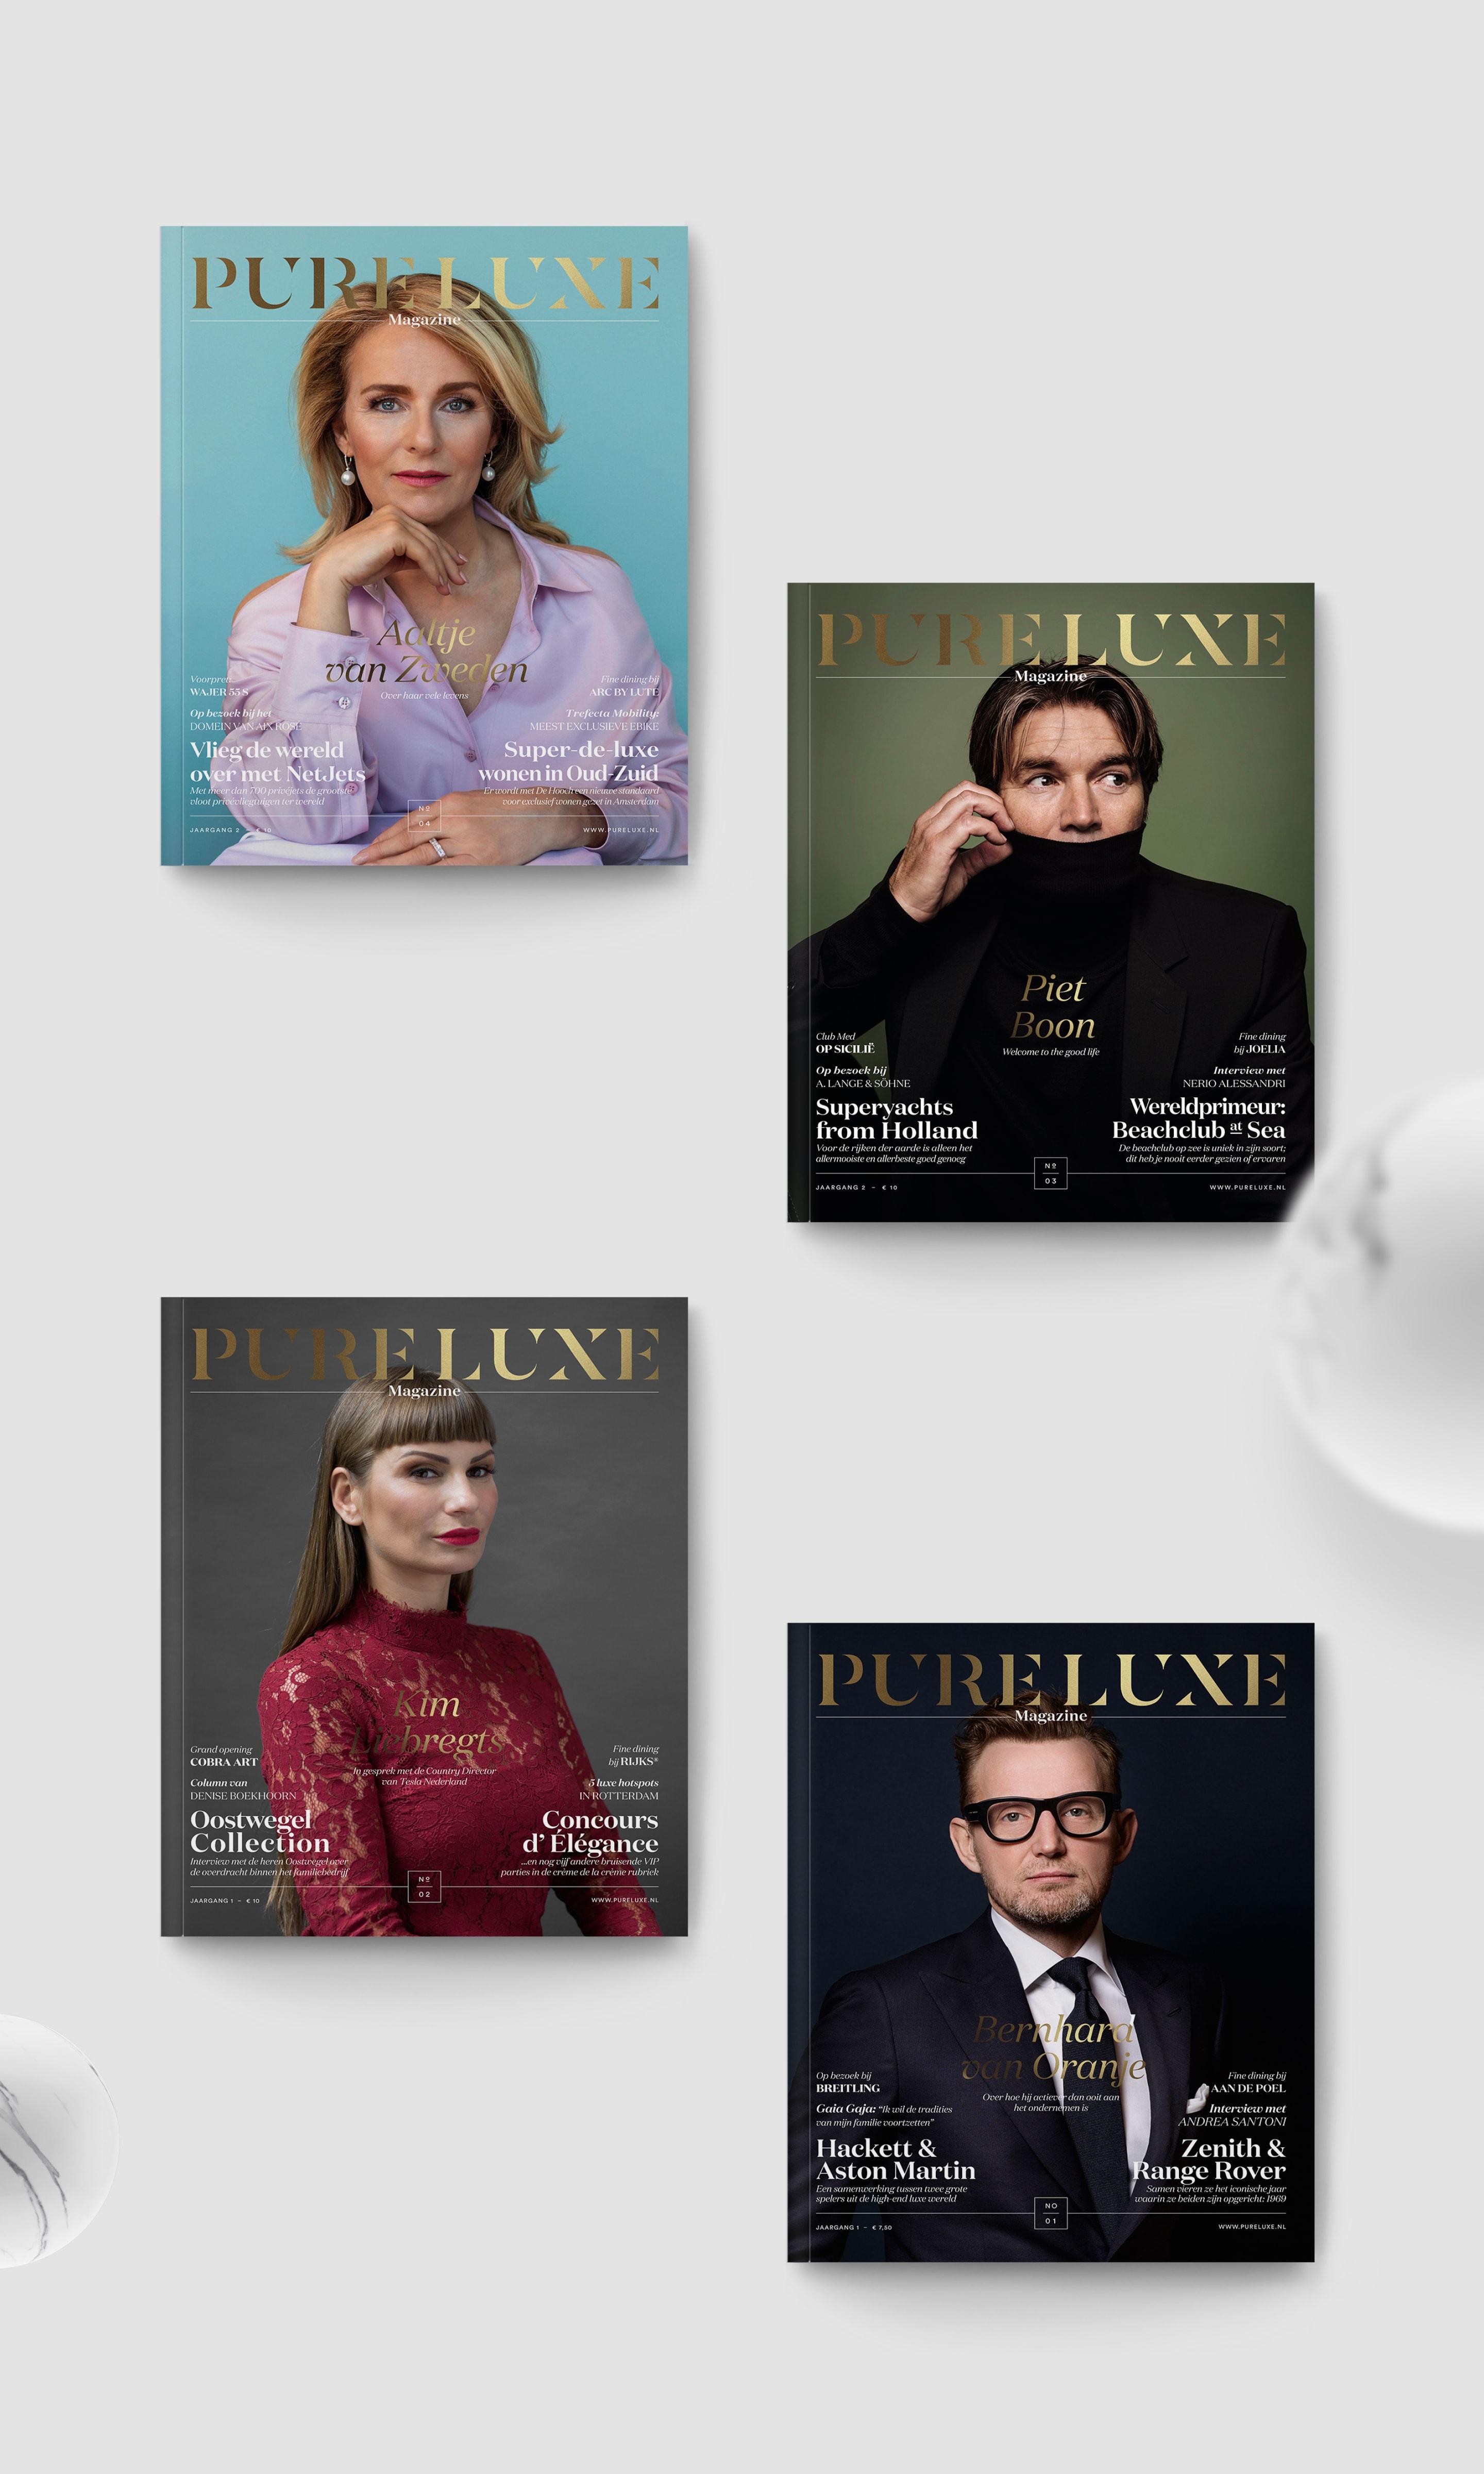 PL-Print-Magazine-3-2